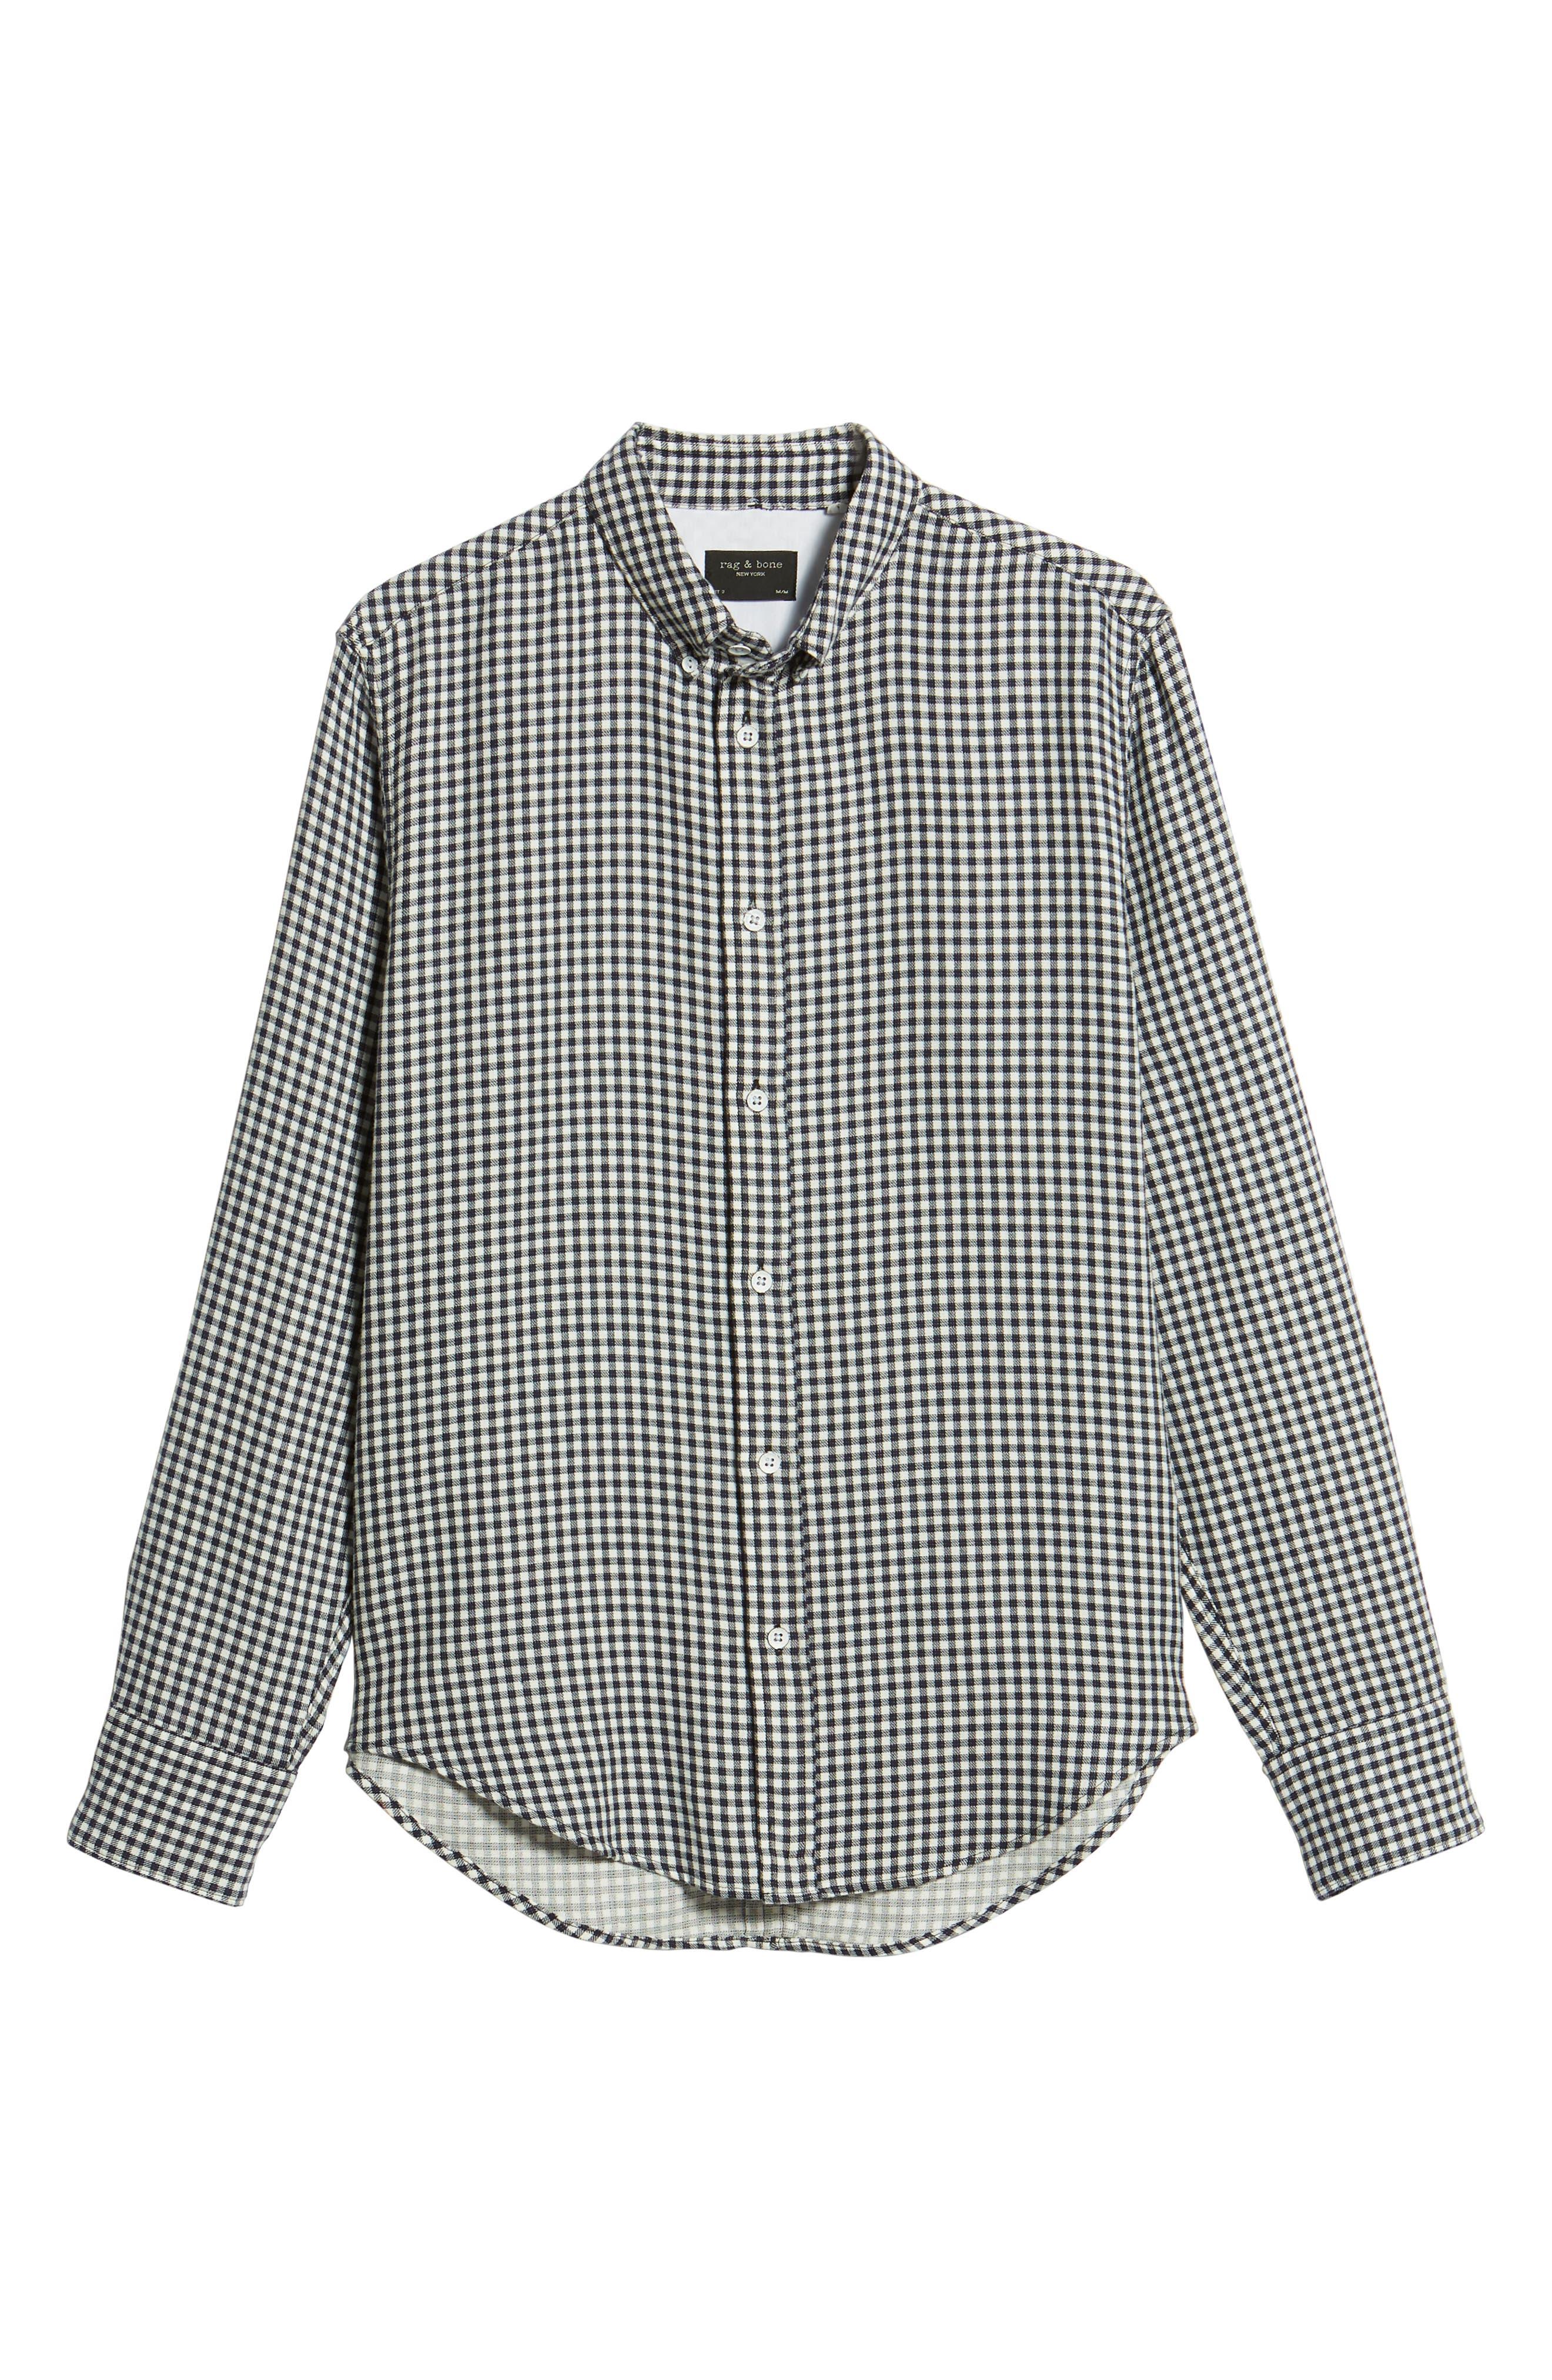 Fit 2 Tomlin Check Sport Shirt,                             Alternate thumbnail 6, color,                             Navy Gingham